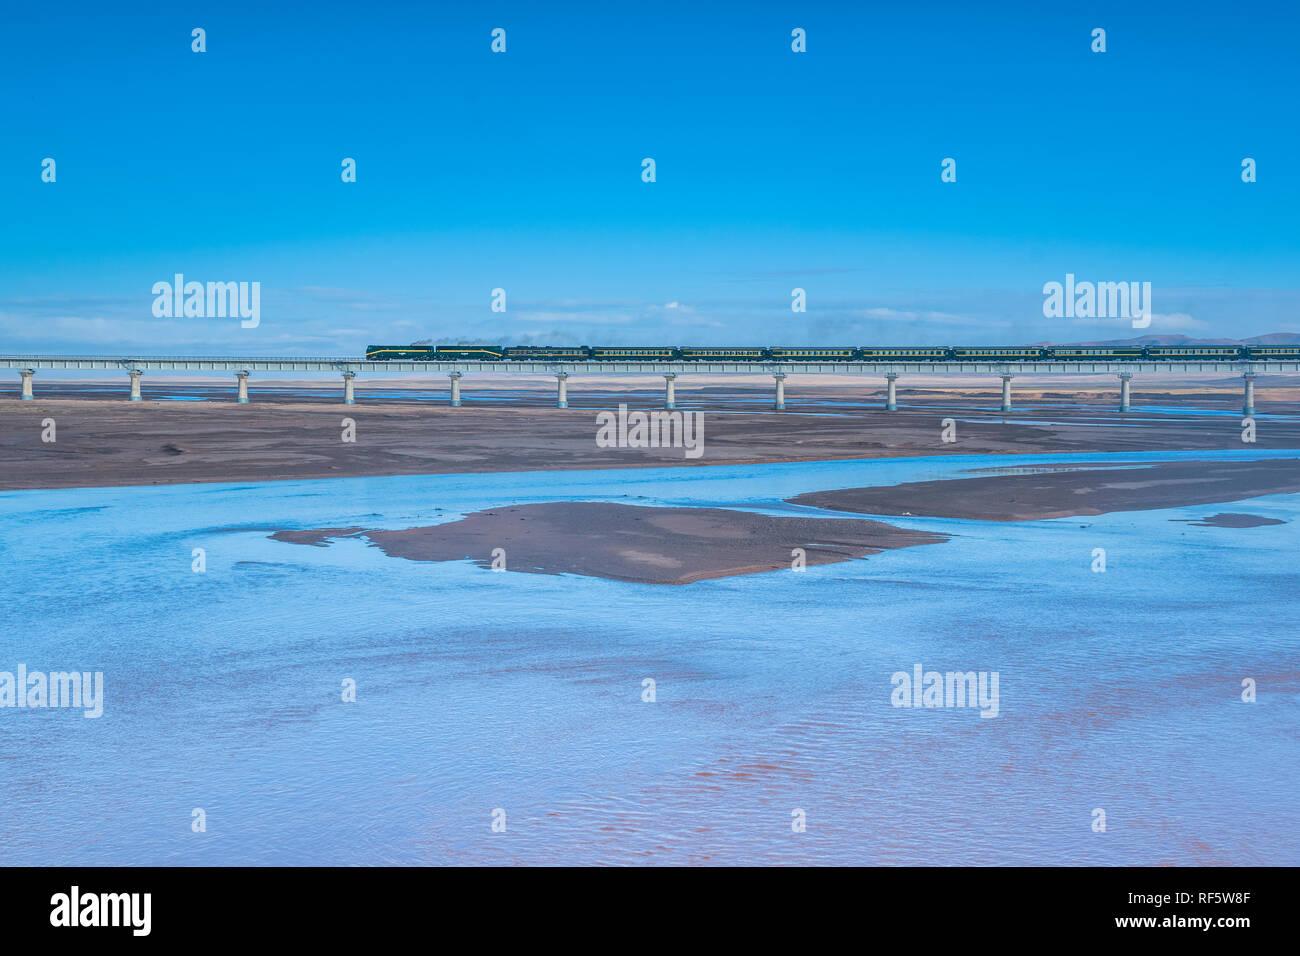 Railway tracks of Qinghai-Tibet railway, Tibet Autonomous Region, China - Stock Image